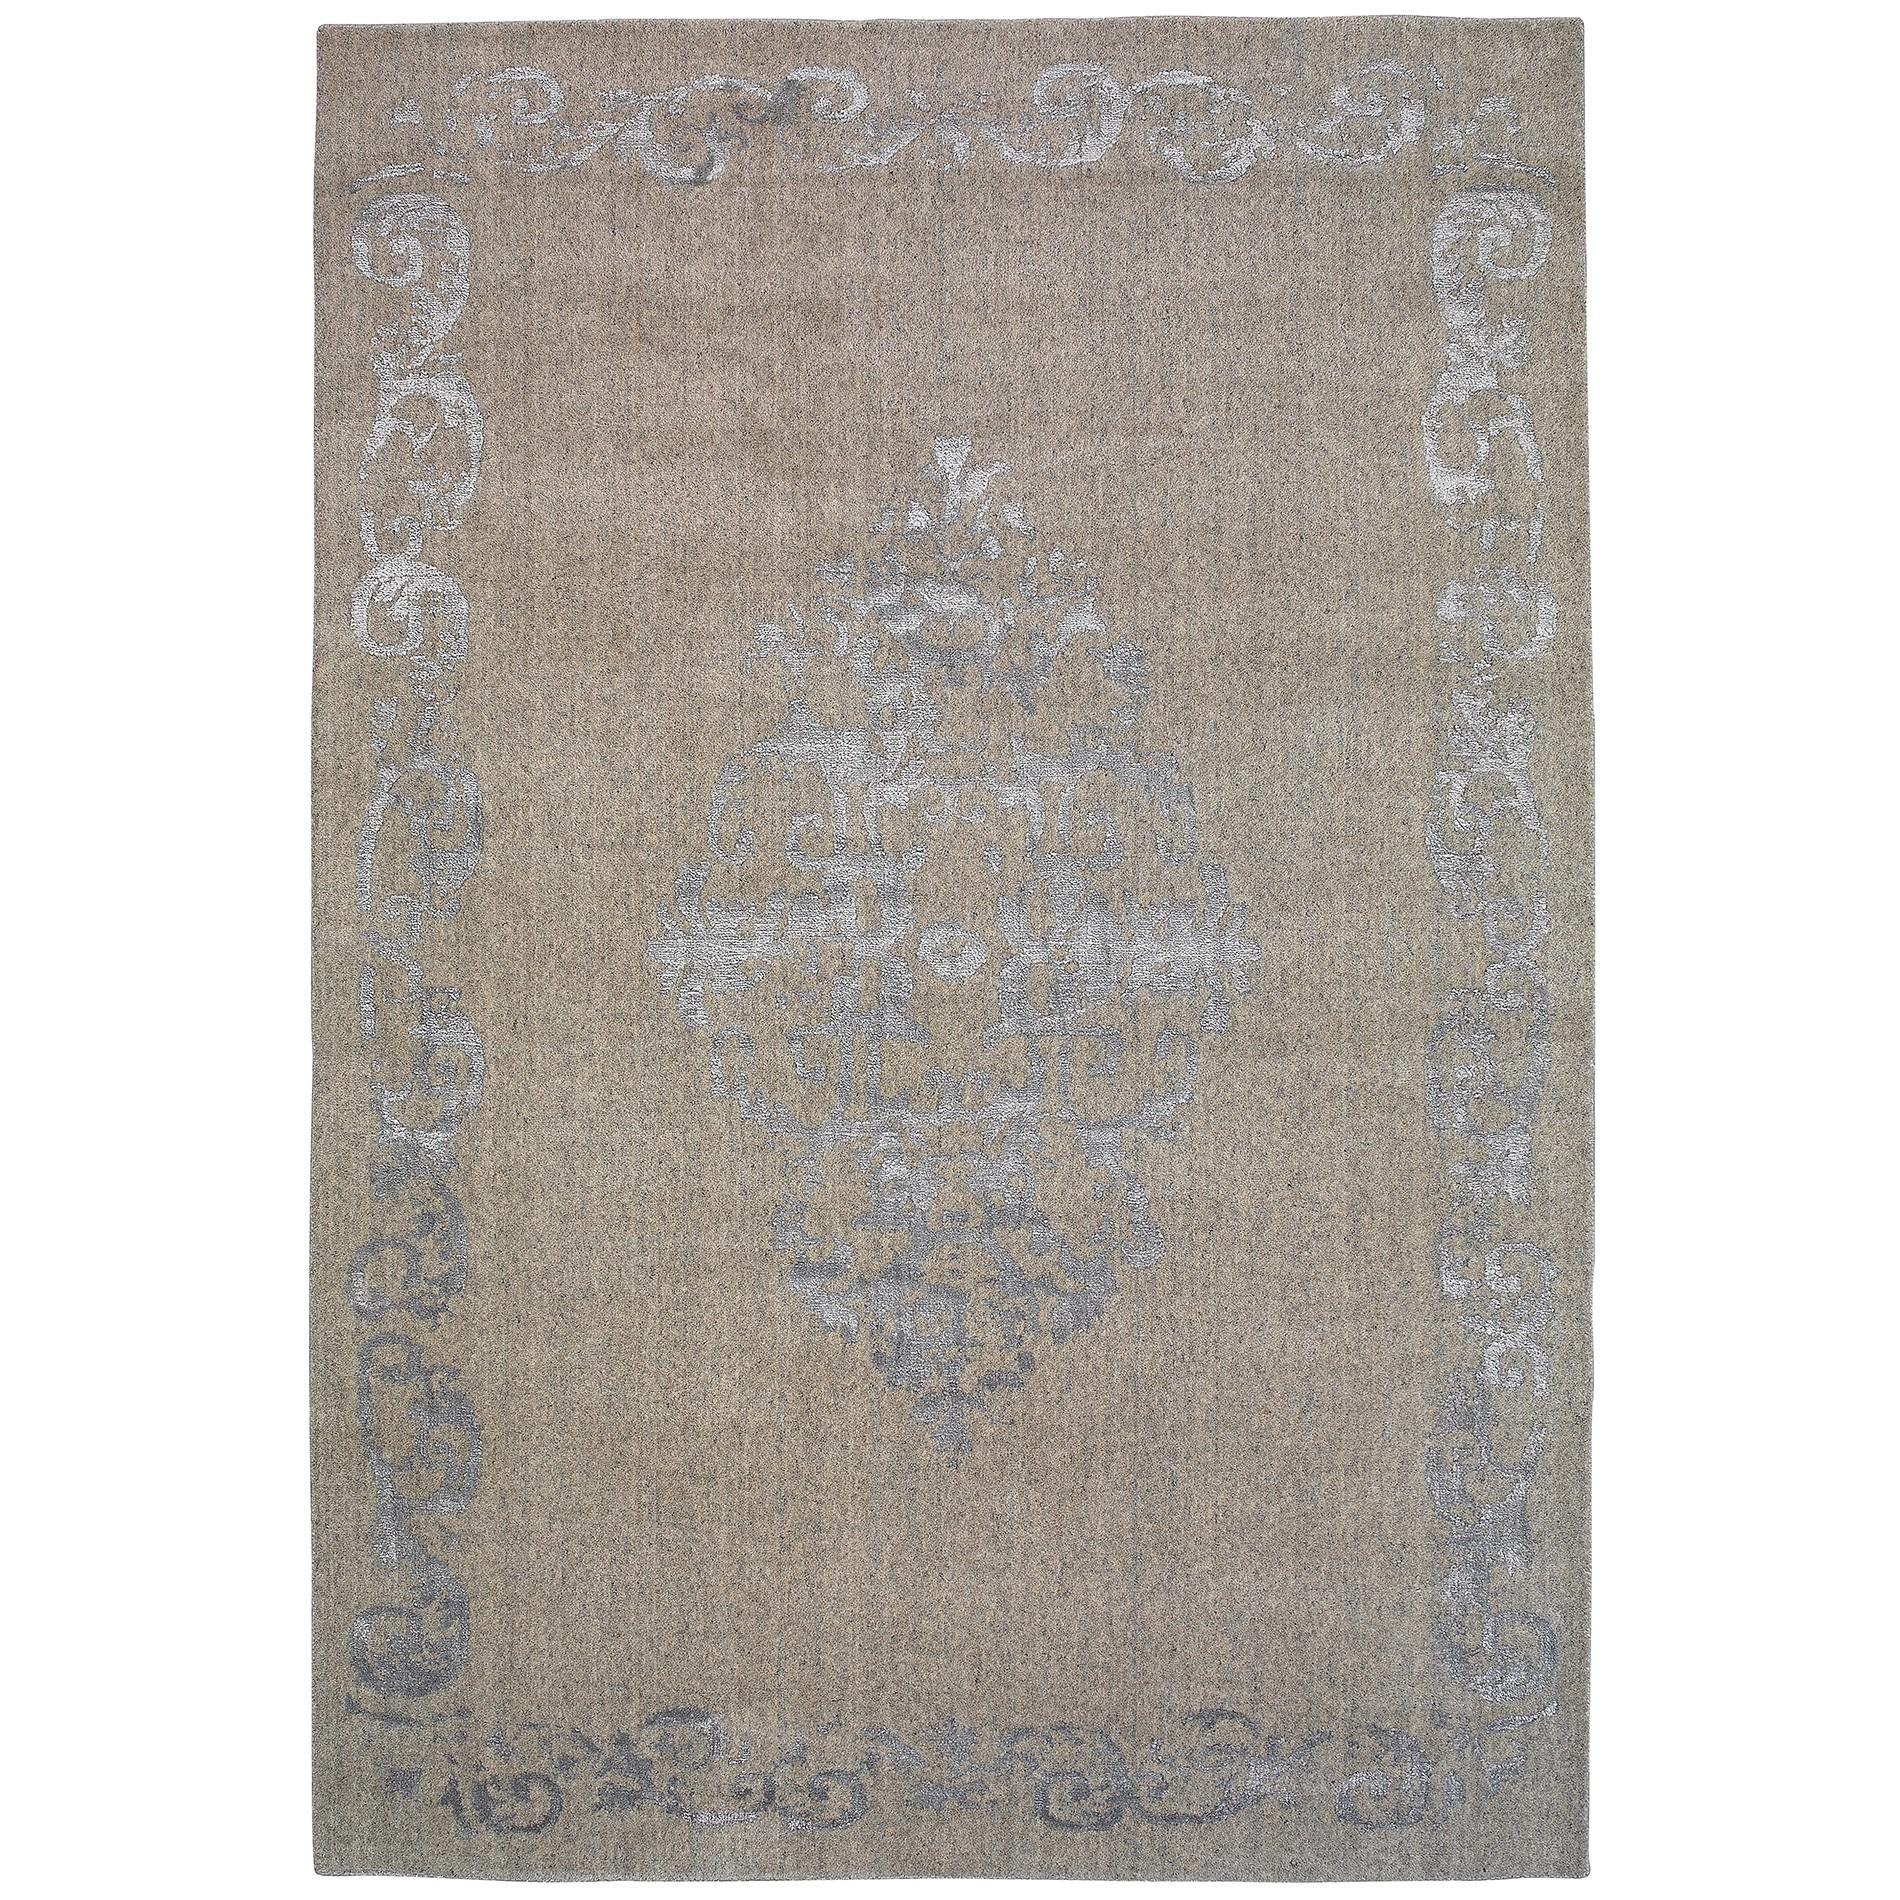 Vienna No.048 Handmade Wool Transitional Rug, 330x240cm, Silver